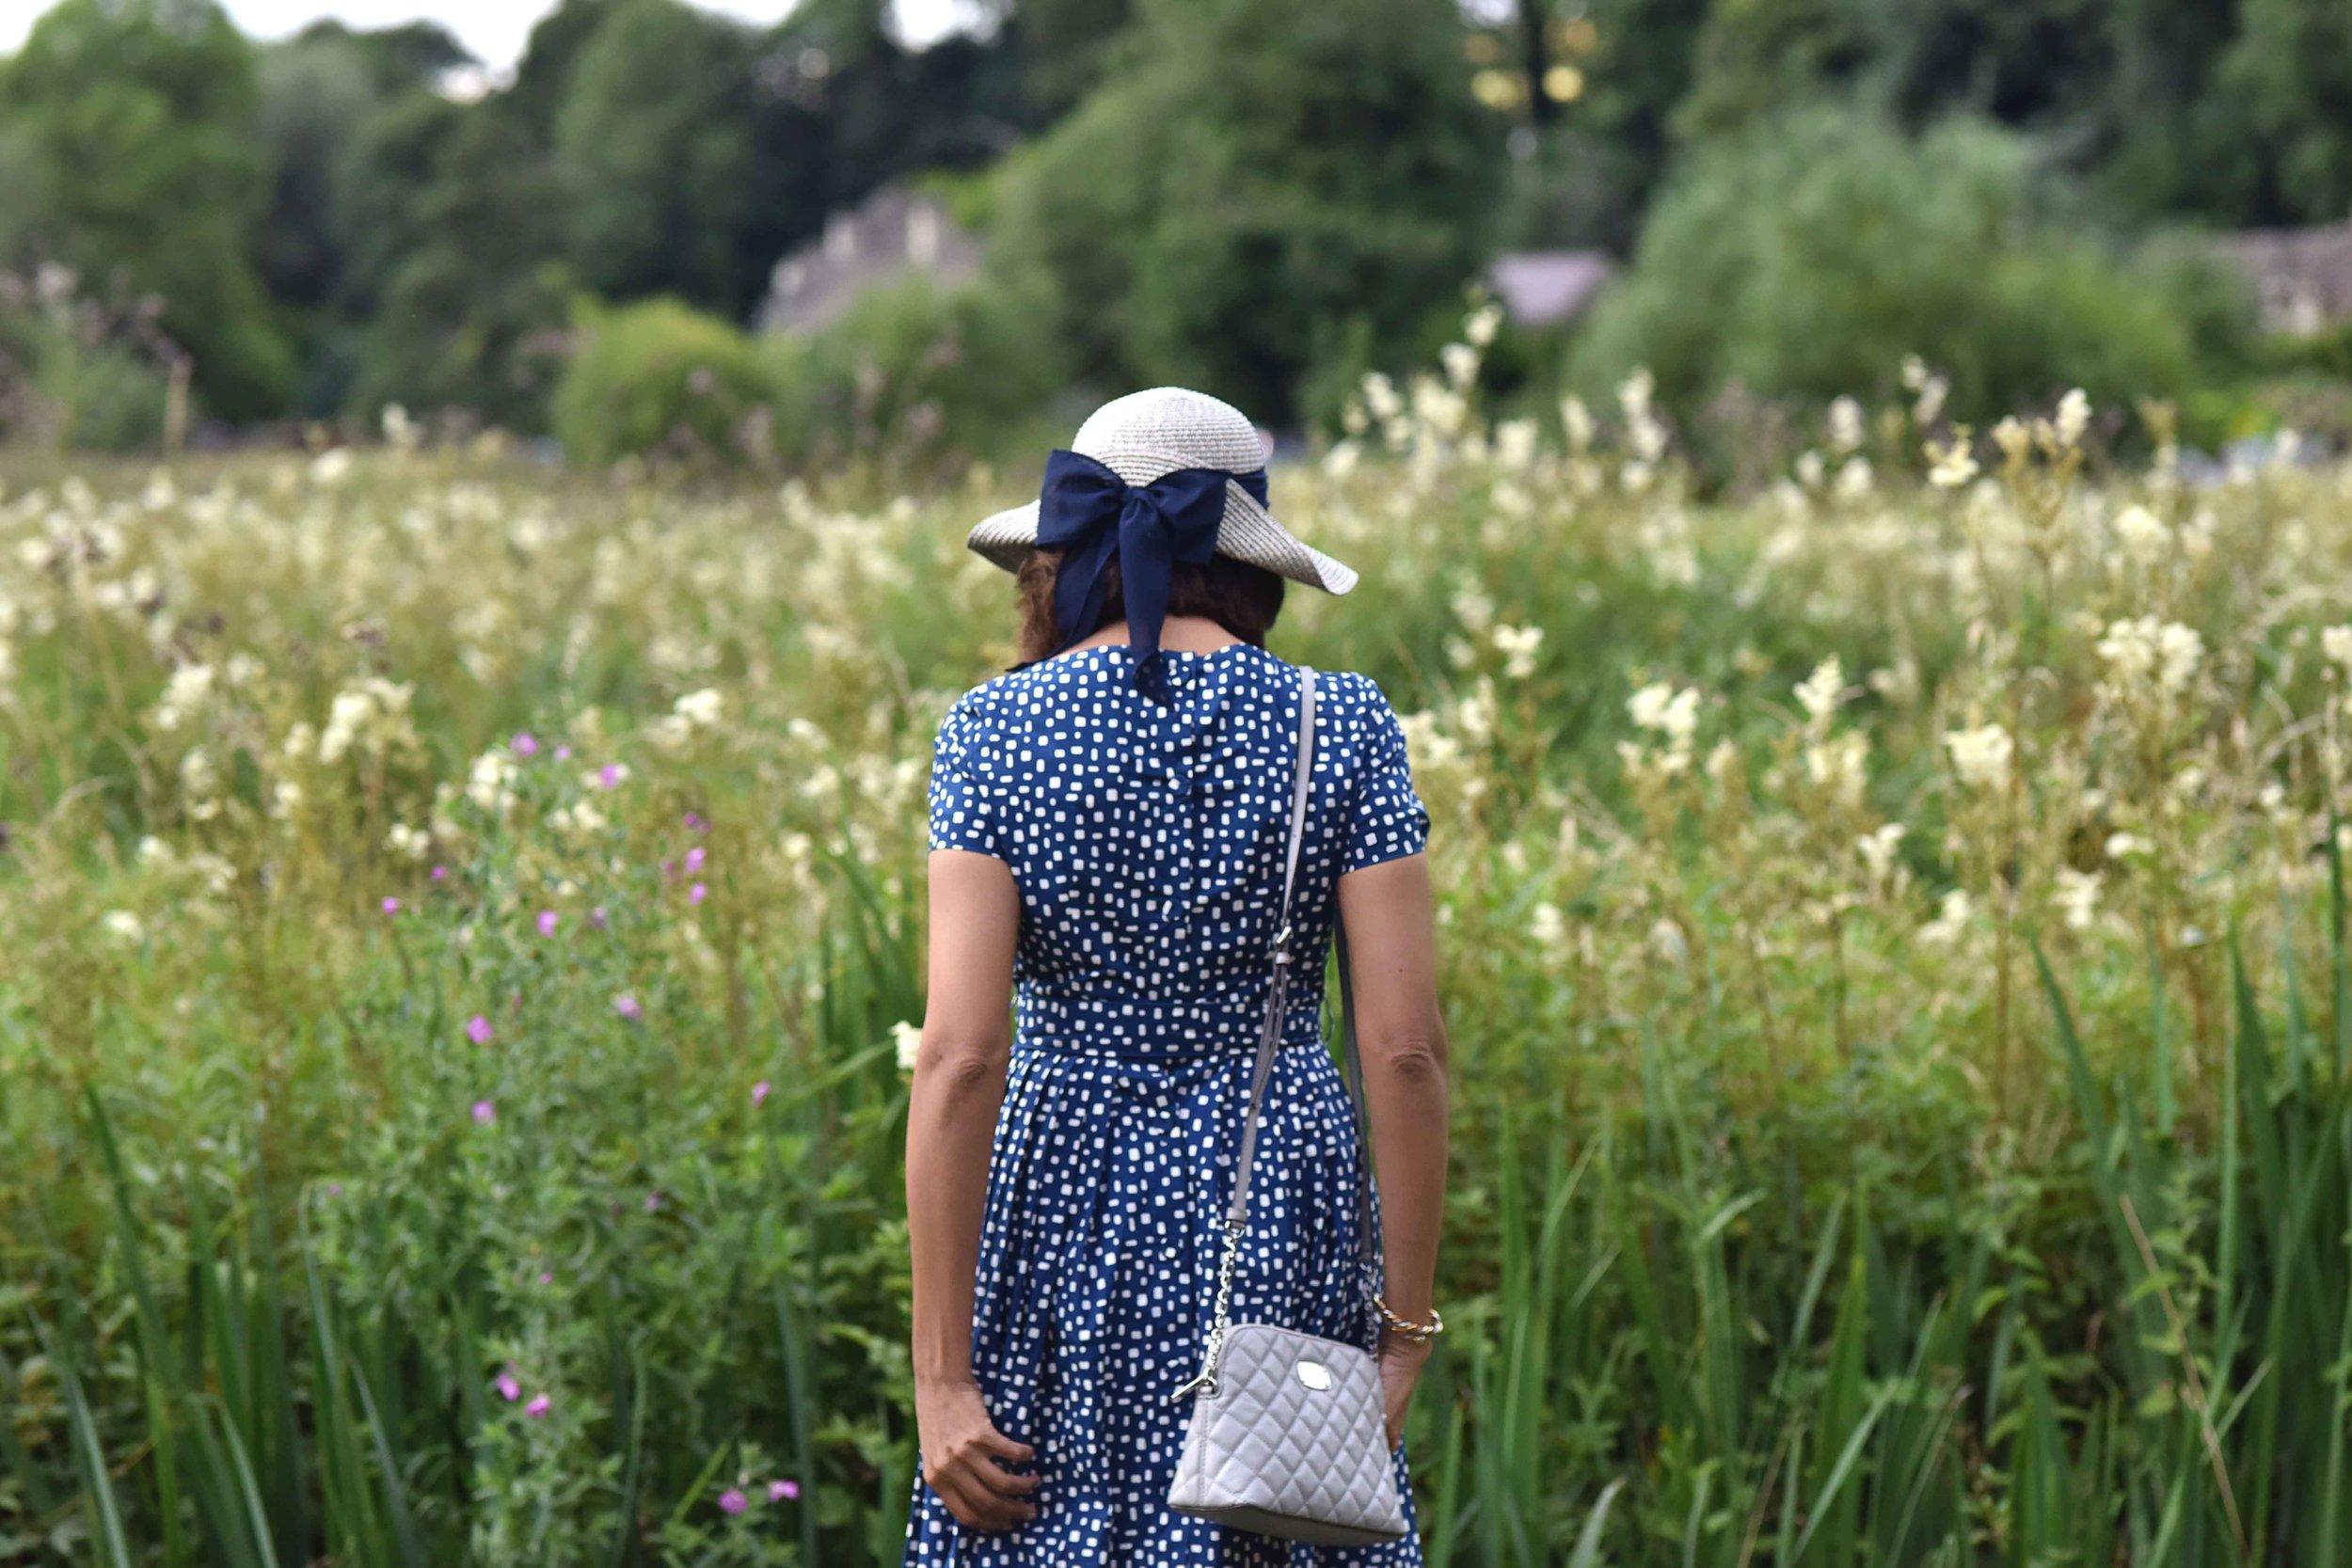 In a Prada dress, Michael Kors bag, Arlington Fields, Bibury, Cotswold, England. Image©sourcingstyle.com